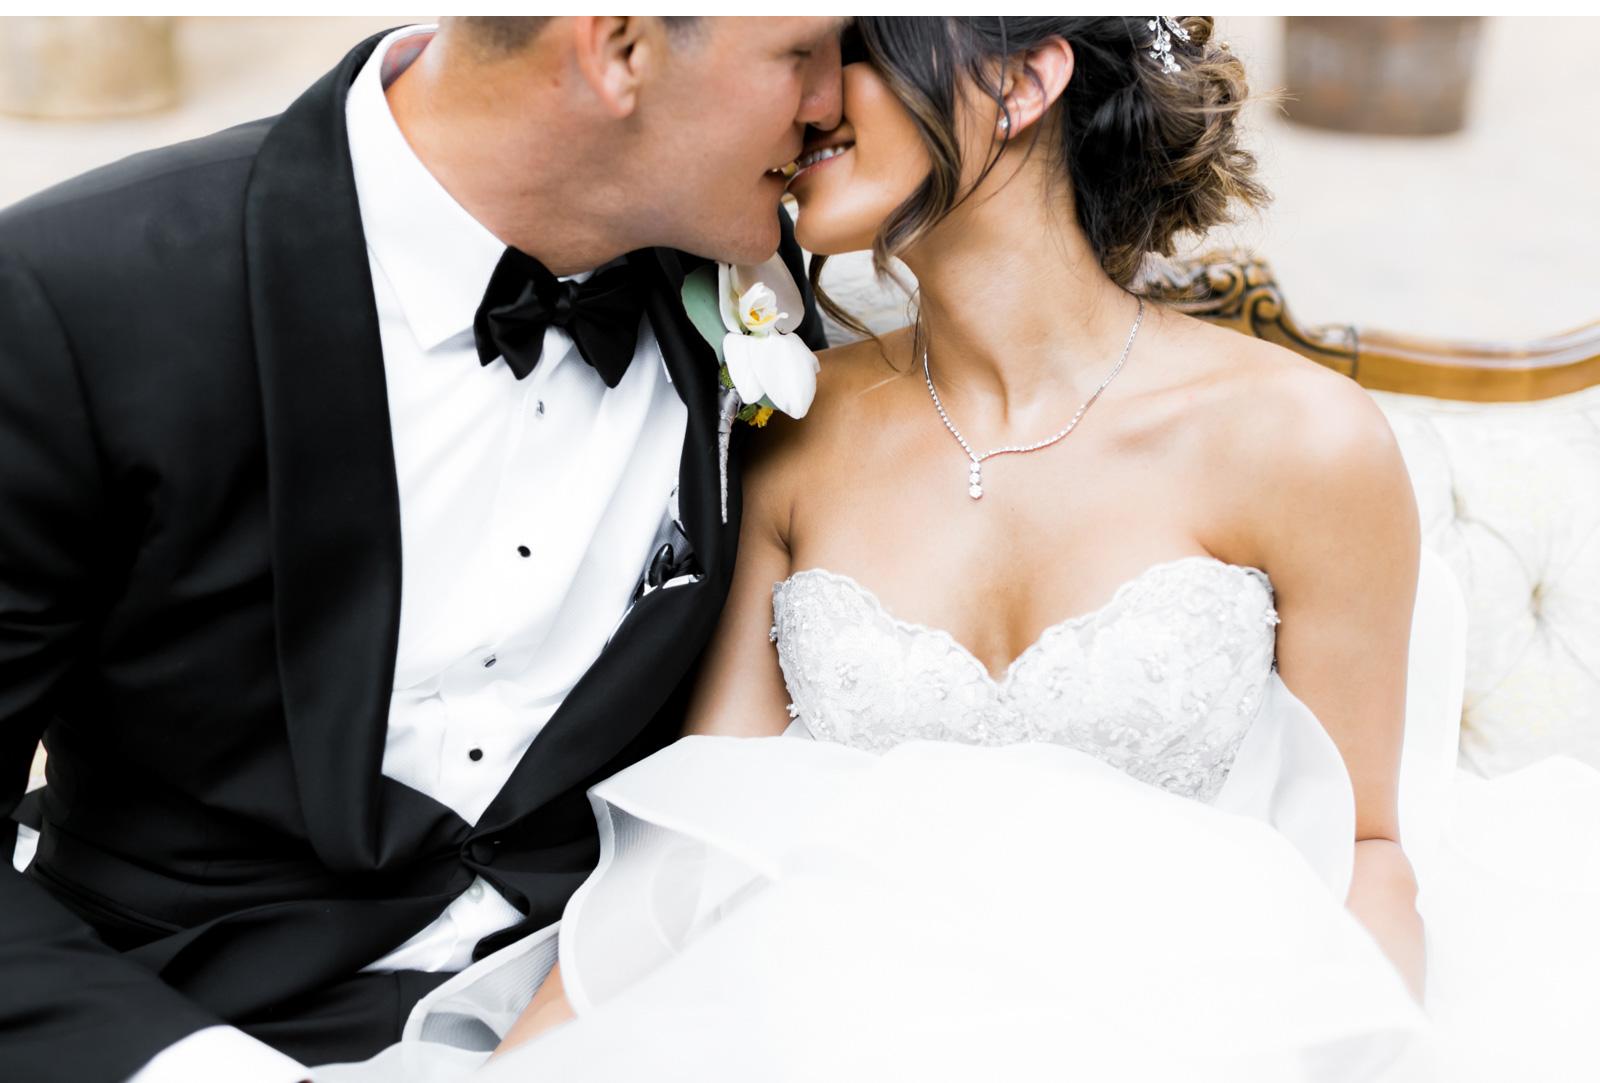 San-Luis-Obispo-Wedding-Photographer-Natalie-Schutt-Photography_03.jpg